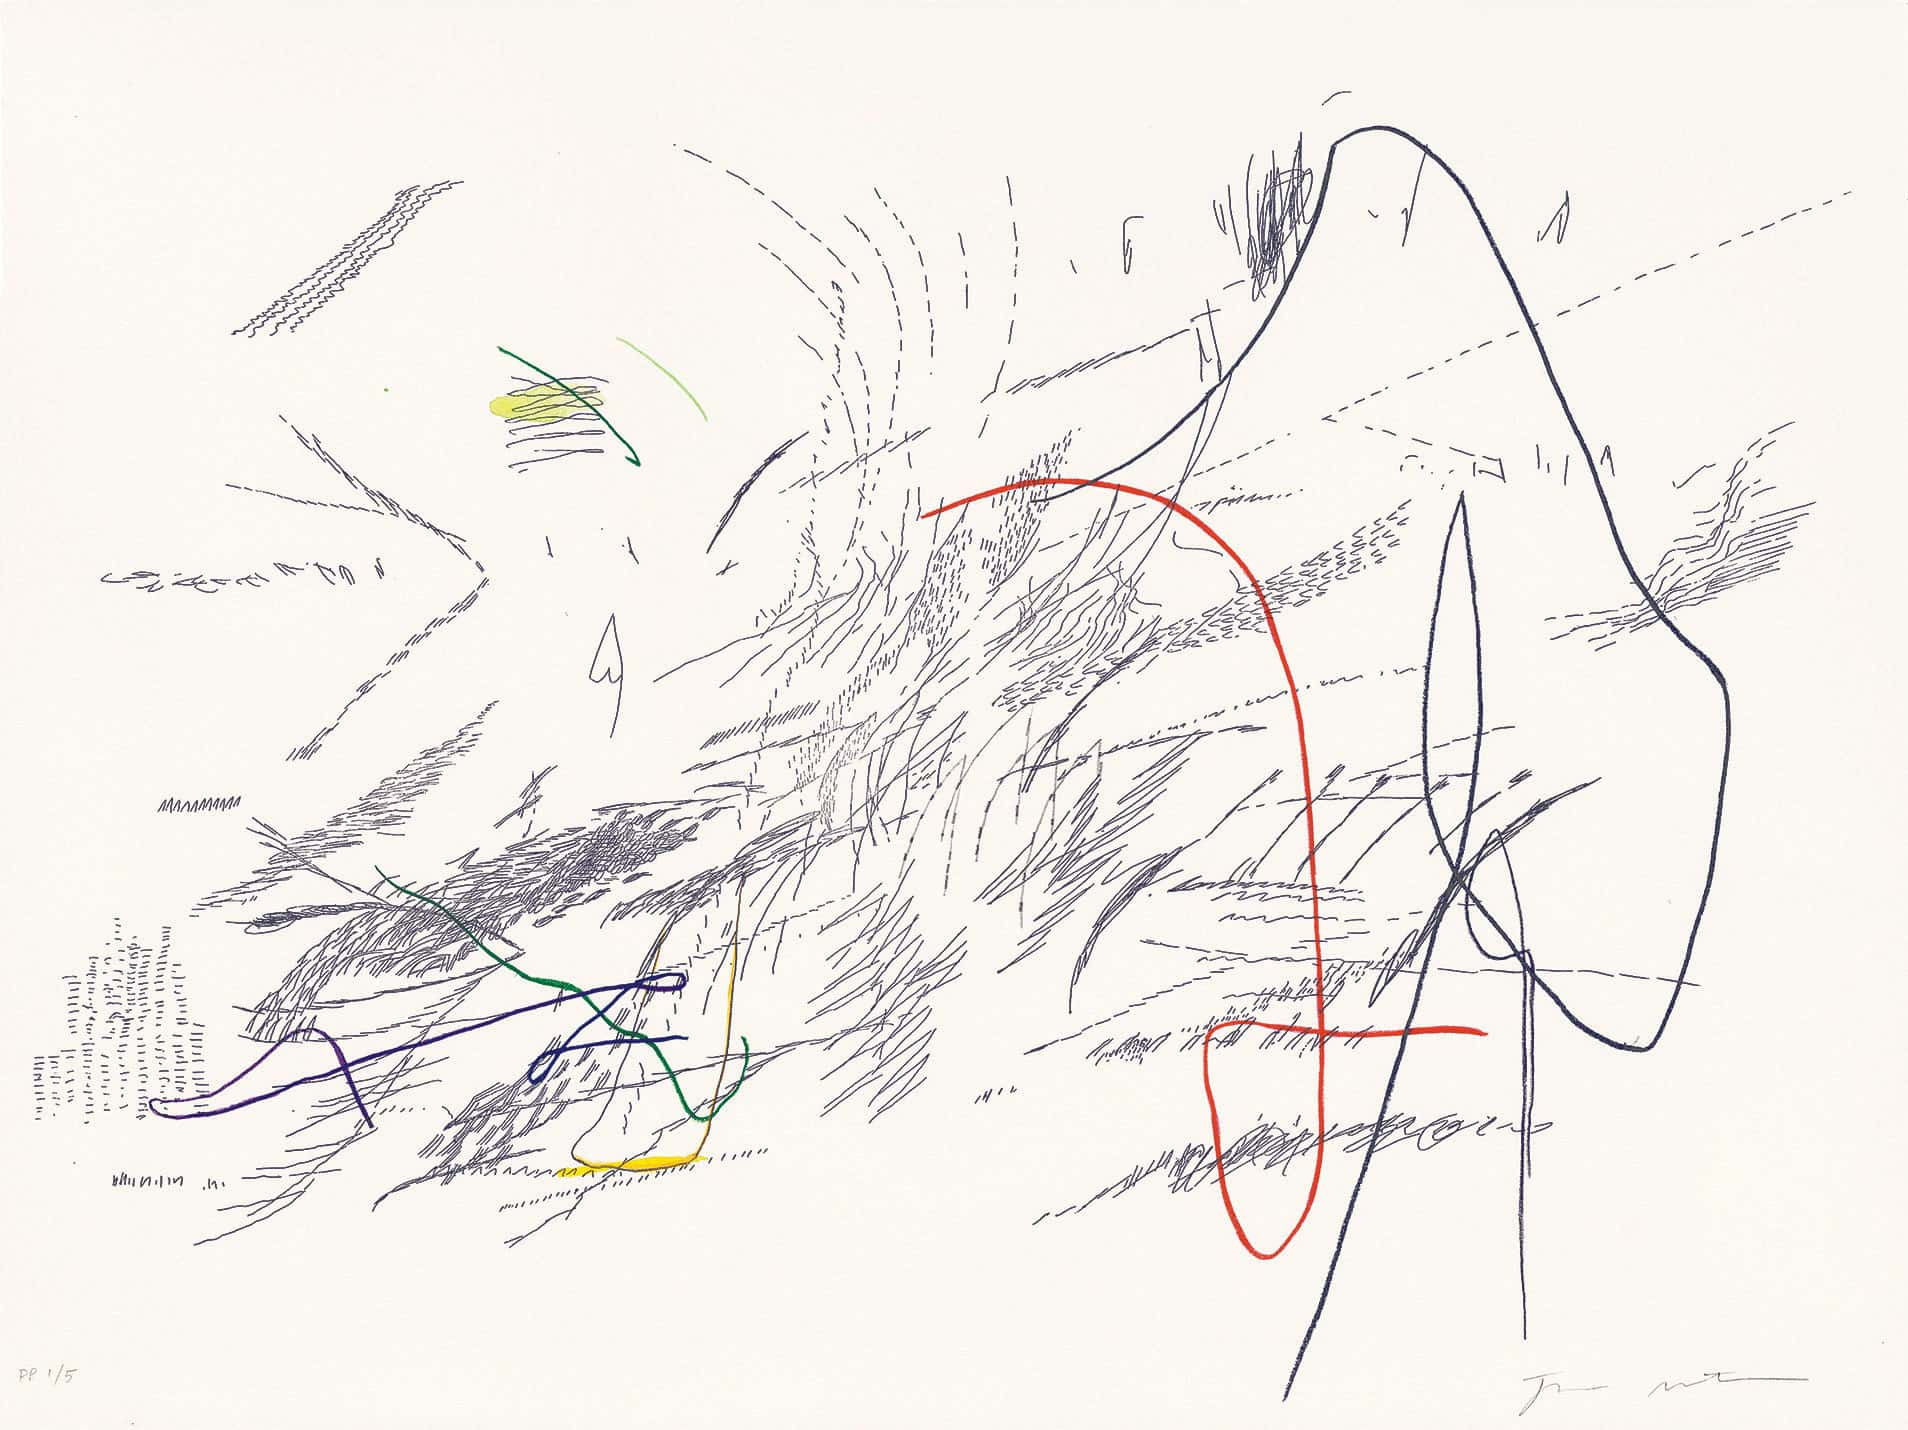 Sappho-Strophe-4.color.jpg